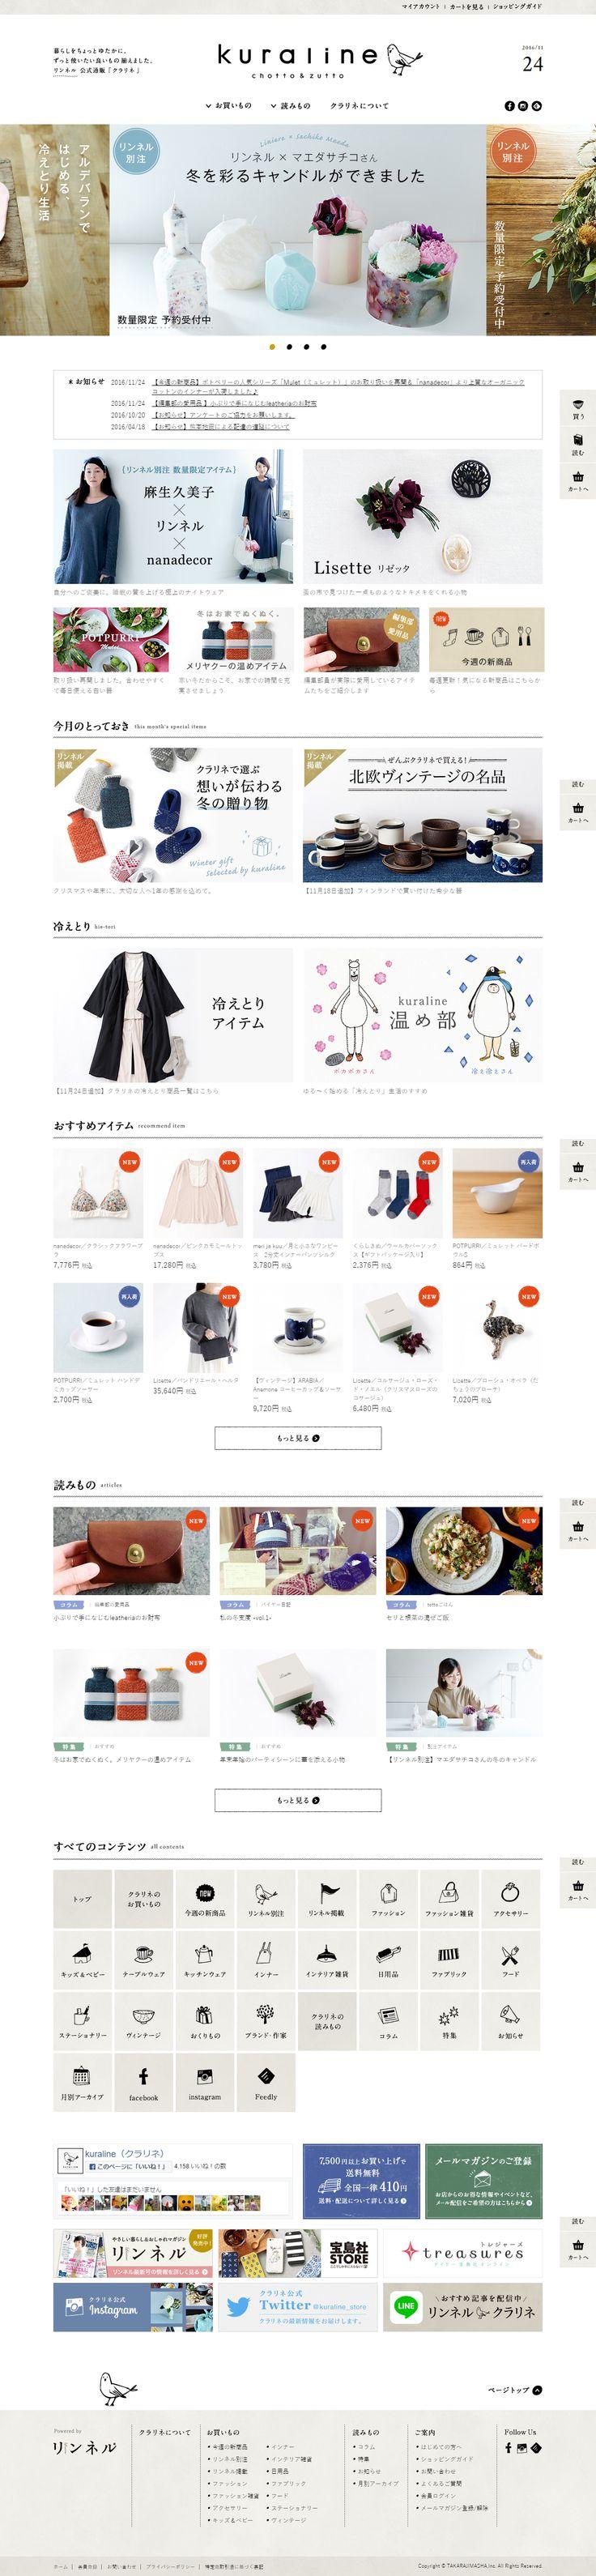 #fashion-web-design #ec #1-column-layout #key-color-black #bg-color-white #Japanese #Flat-design #Illustration #Texture